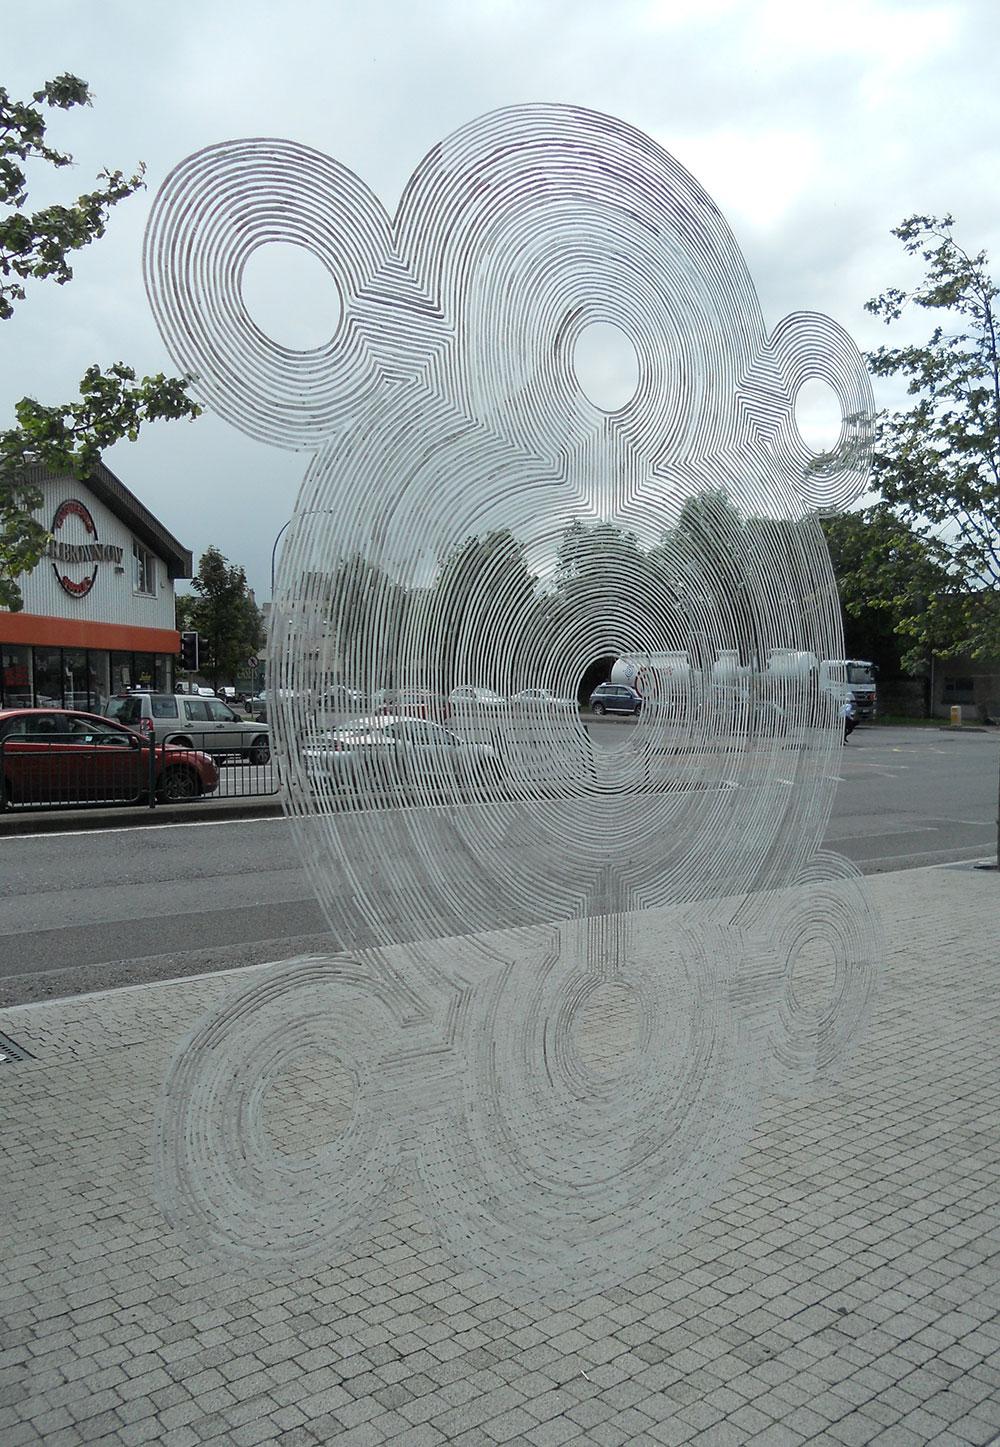 Ink on window, Solstice Festival, Cork